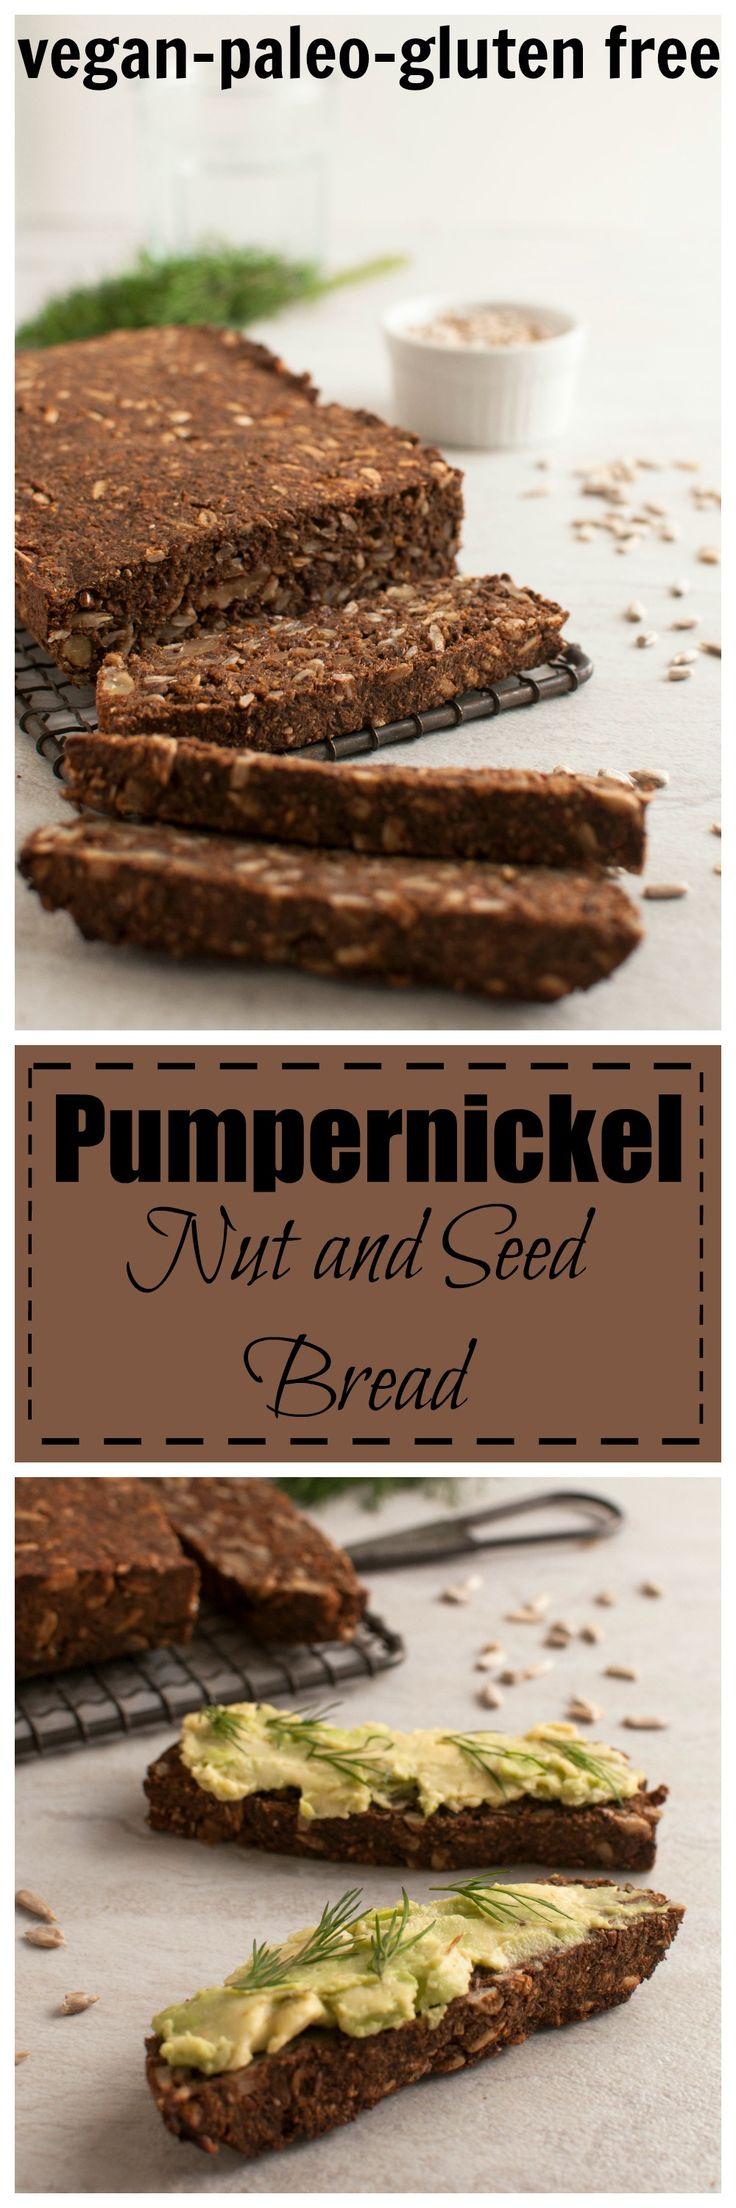 Pumpernickle Nut and Seed Bread #vegan #paleo #glutenfree